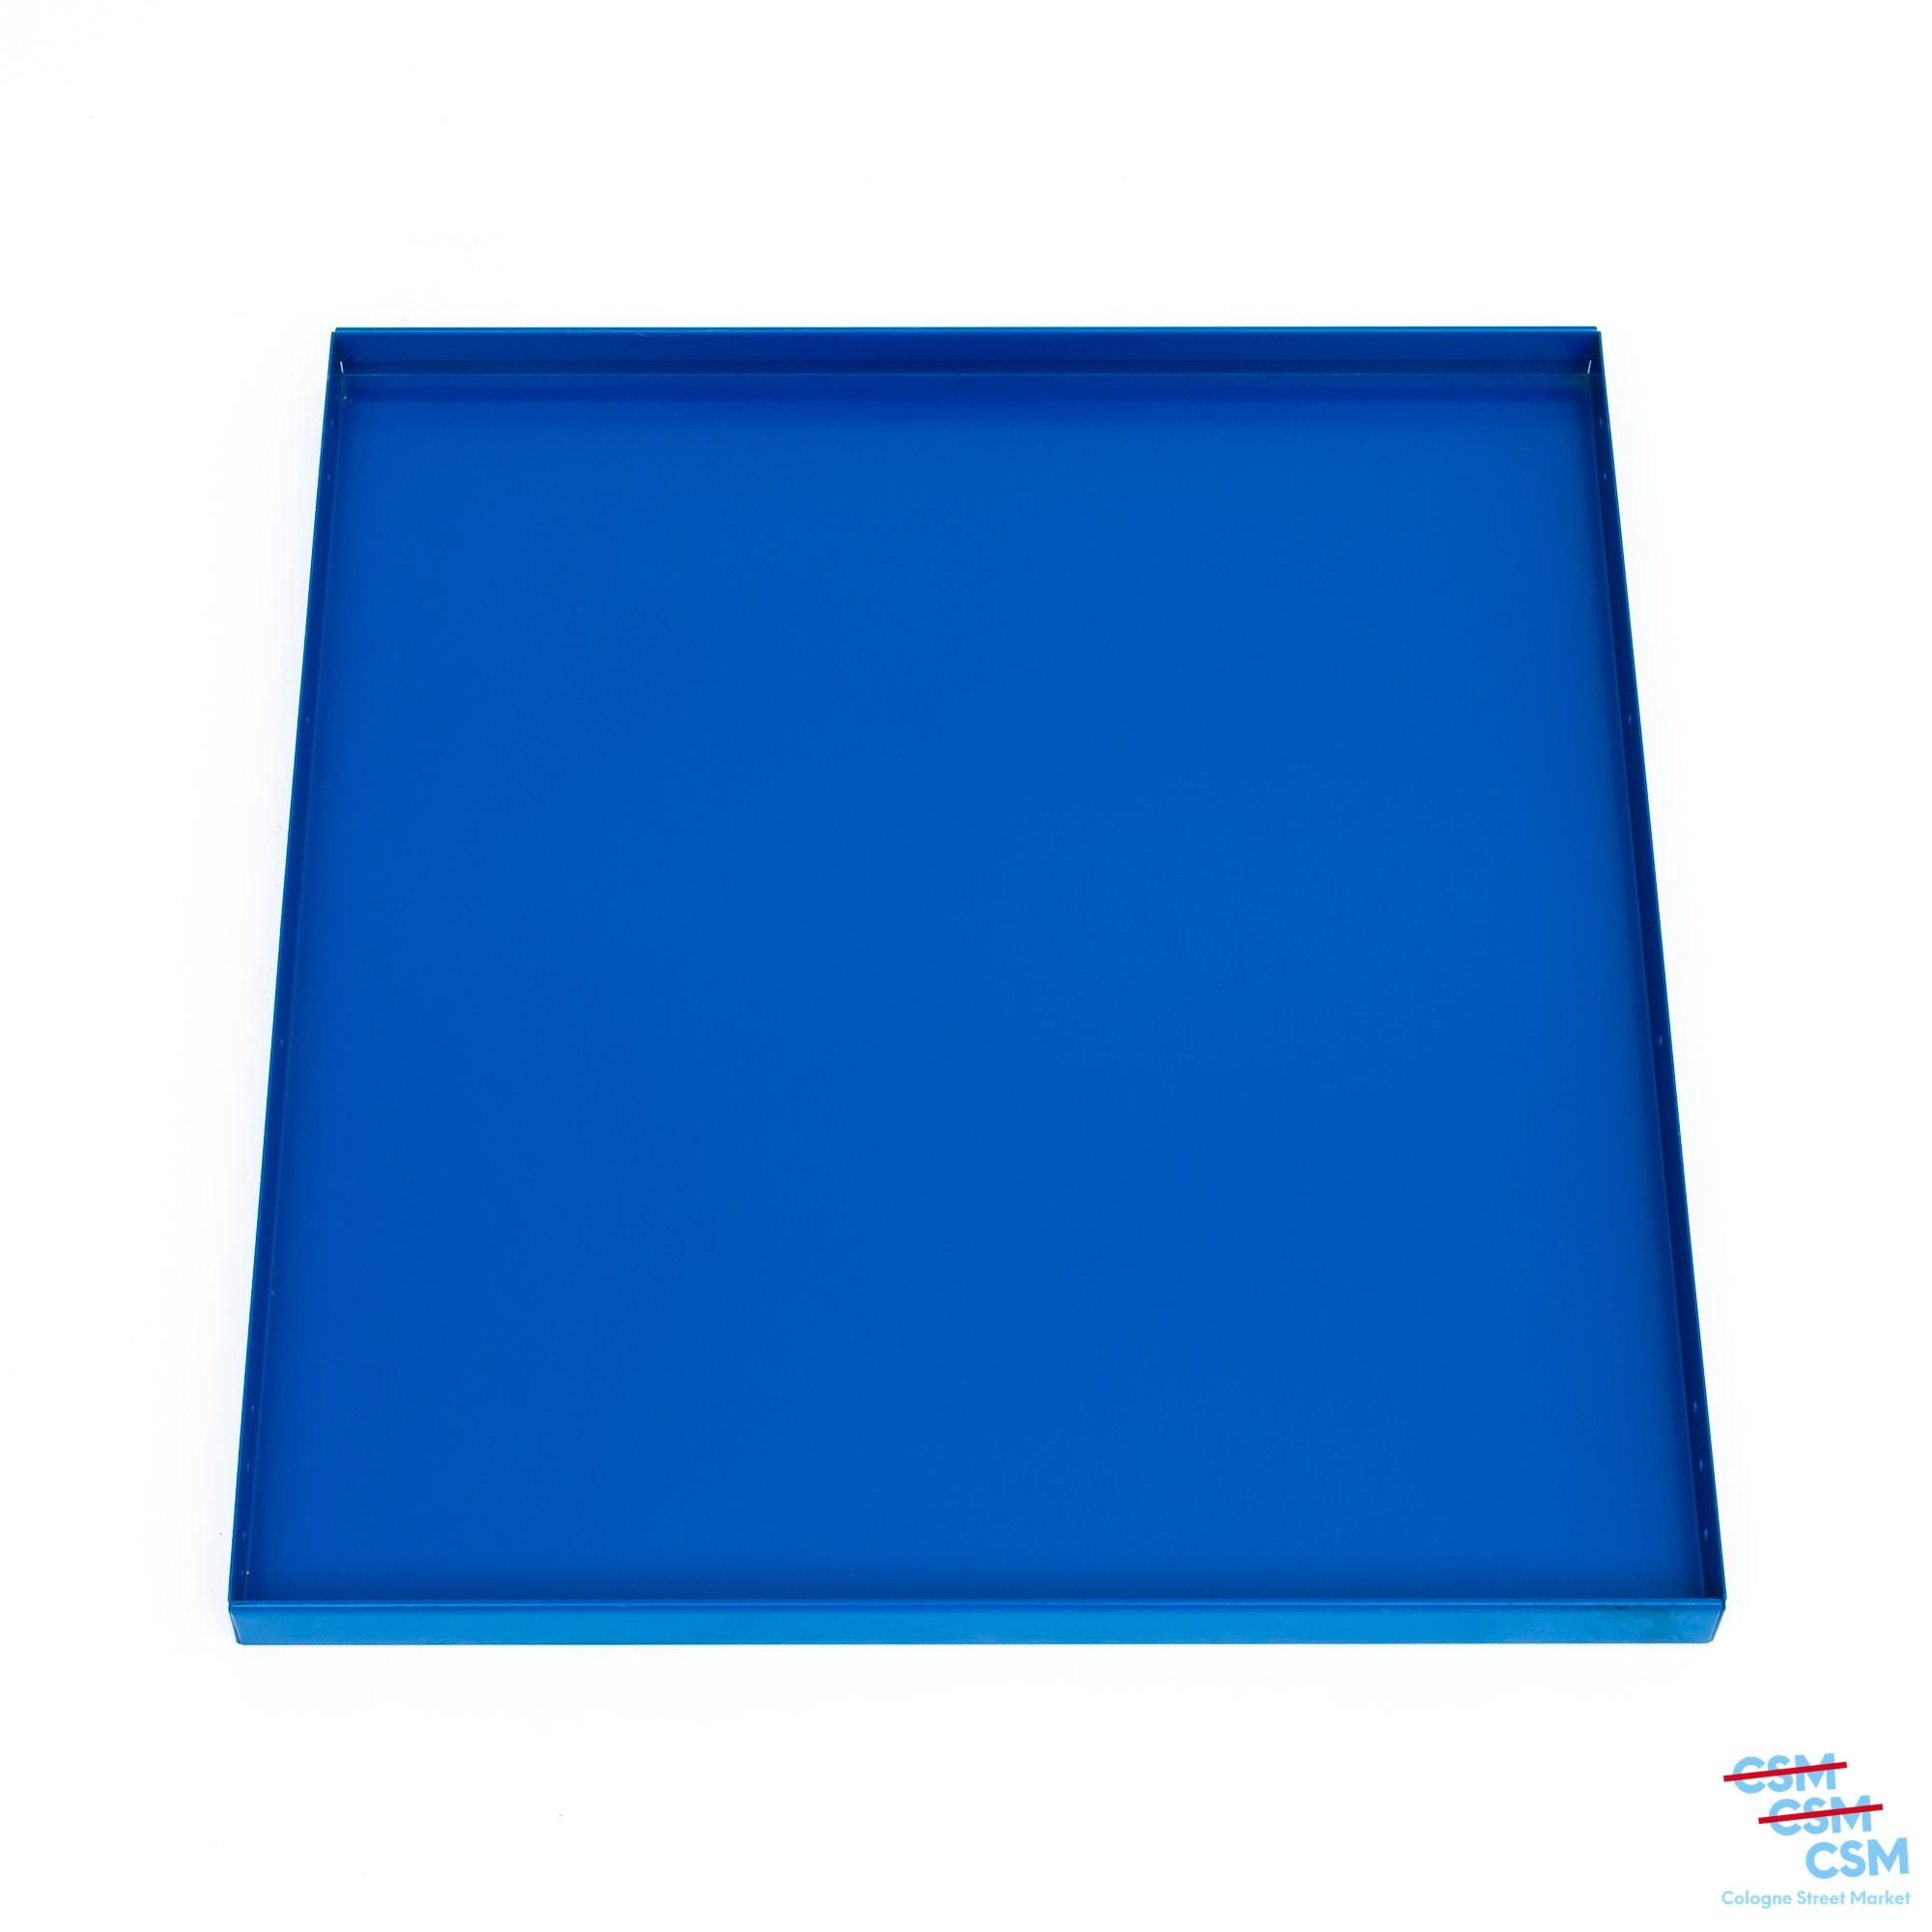 USM Haller Auszugwanne 50x50xm enzianblau gebraucht 1